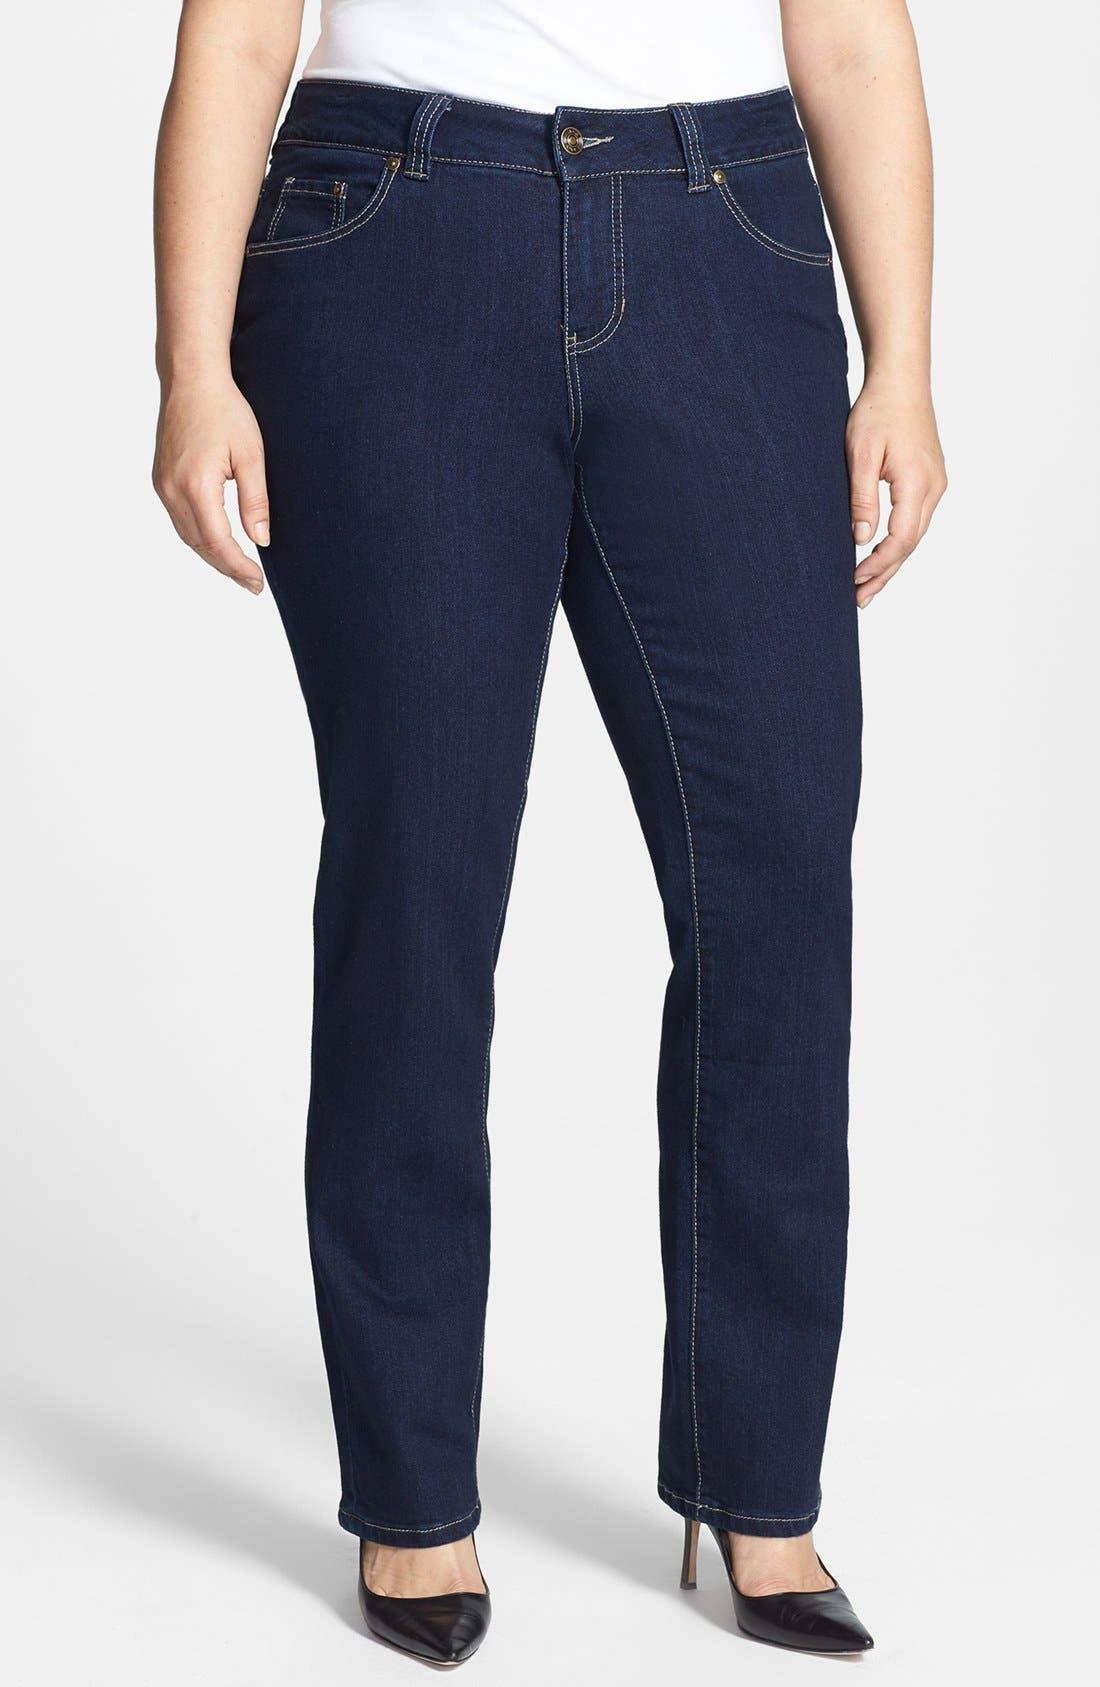 Alternate Image 1 Selected - Jag Jeans 'Alta' Straight Leg Jeans (Plus Size)